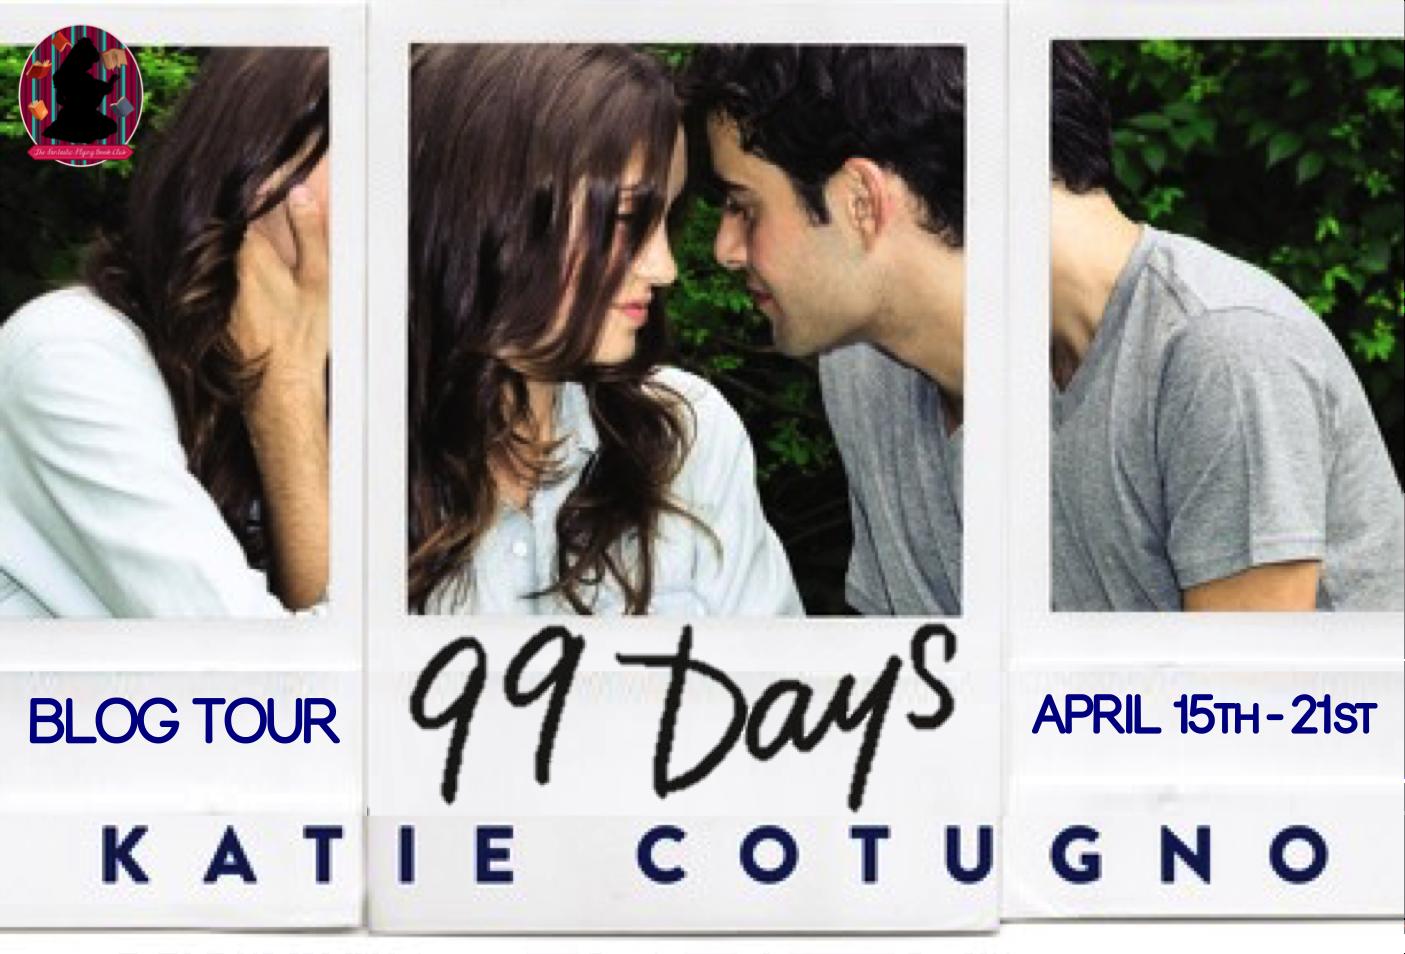 99 Days